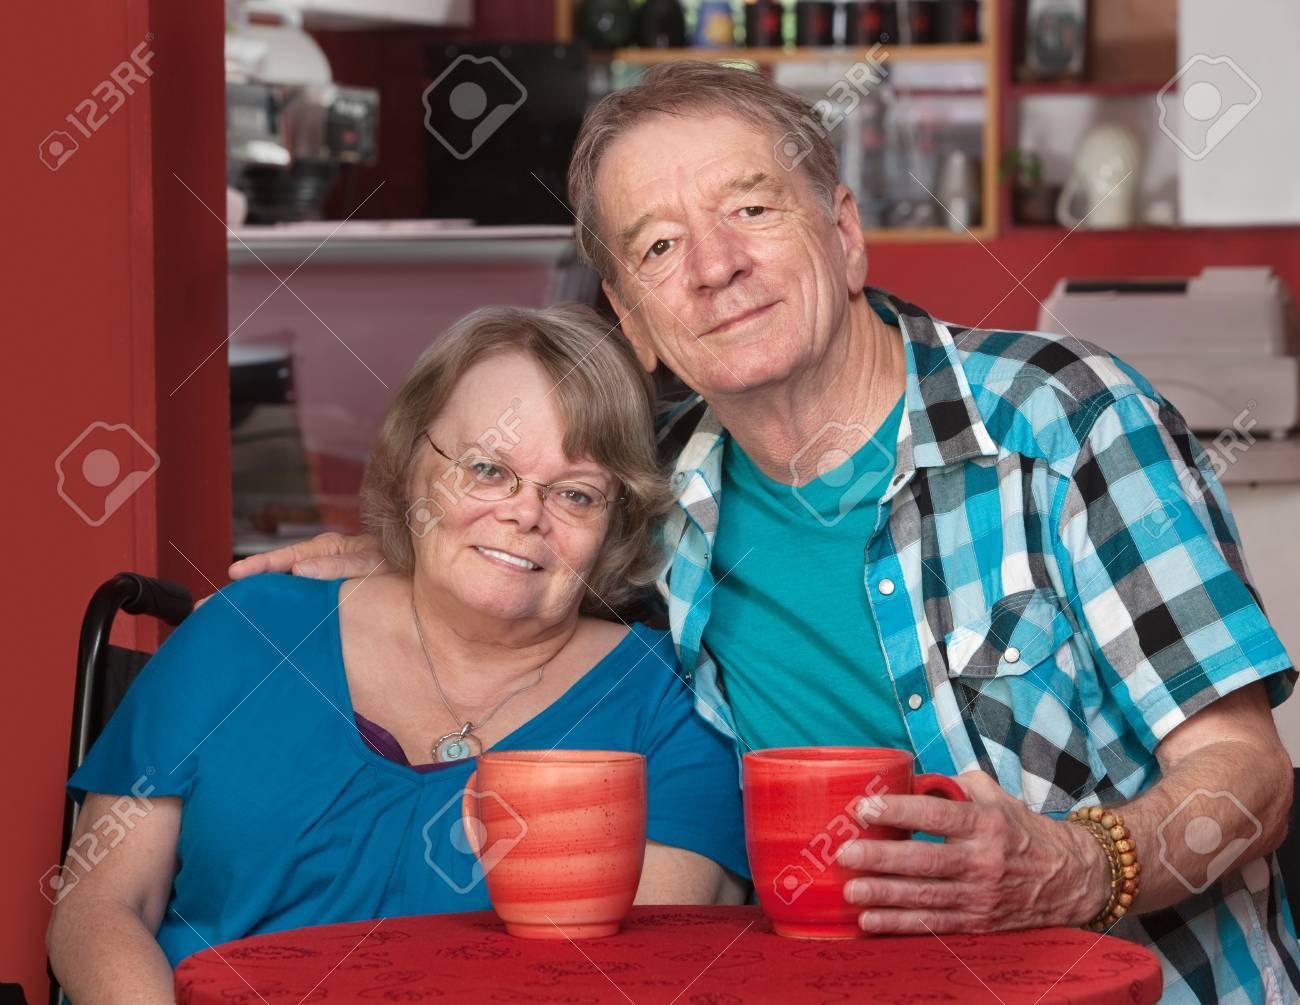 Joyful senior friends sitting with mugs at table Stock Photo - 17019815